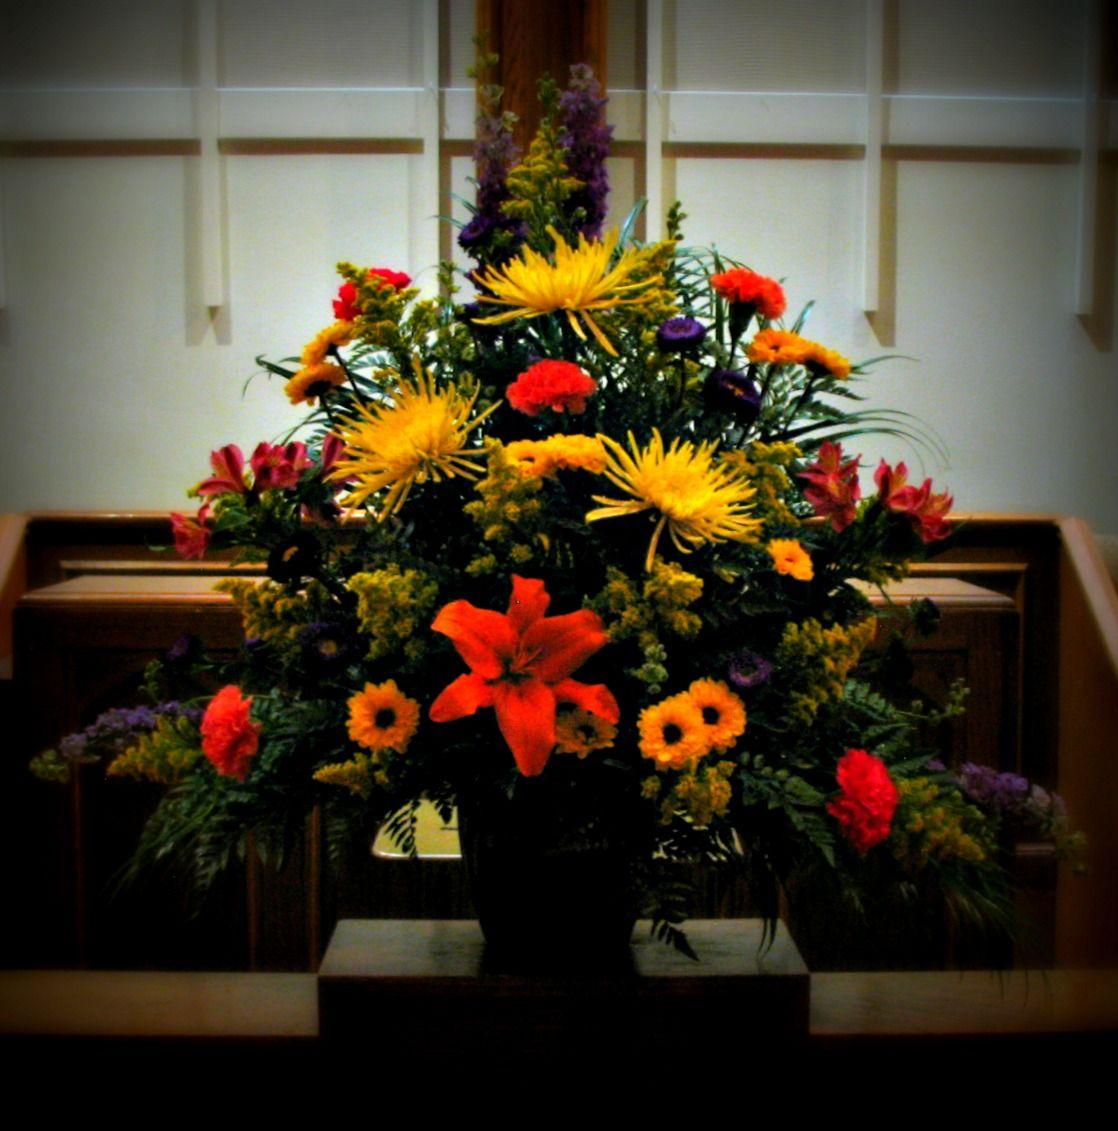 Altar Flowers For Sunday Service At First United Methodist Church Church Flower Arrangements Altar Flowers Flower Arrangements